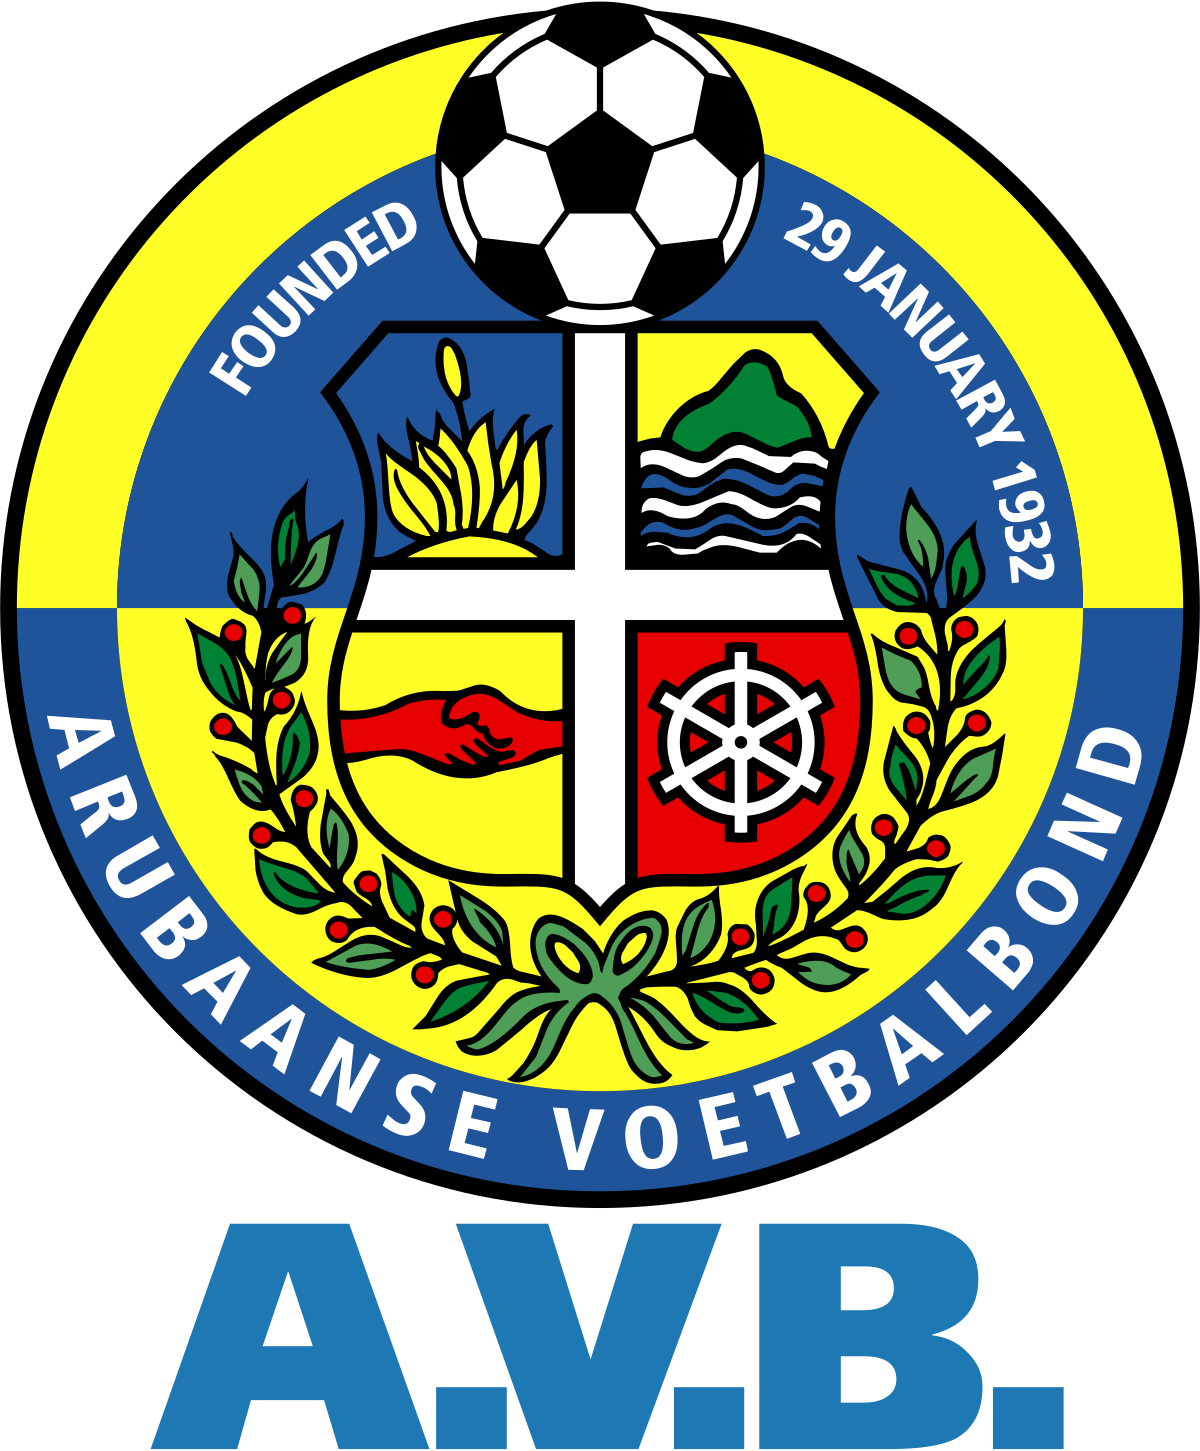 Aruba team logo